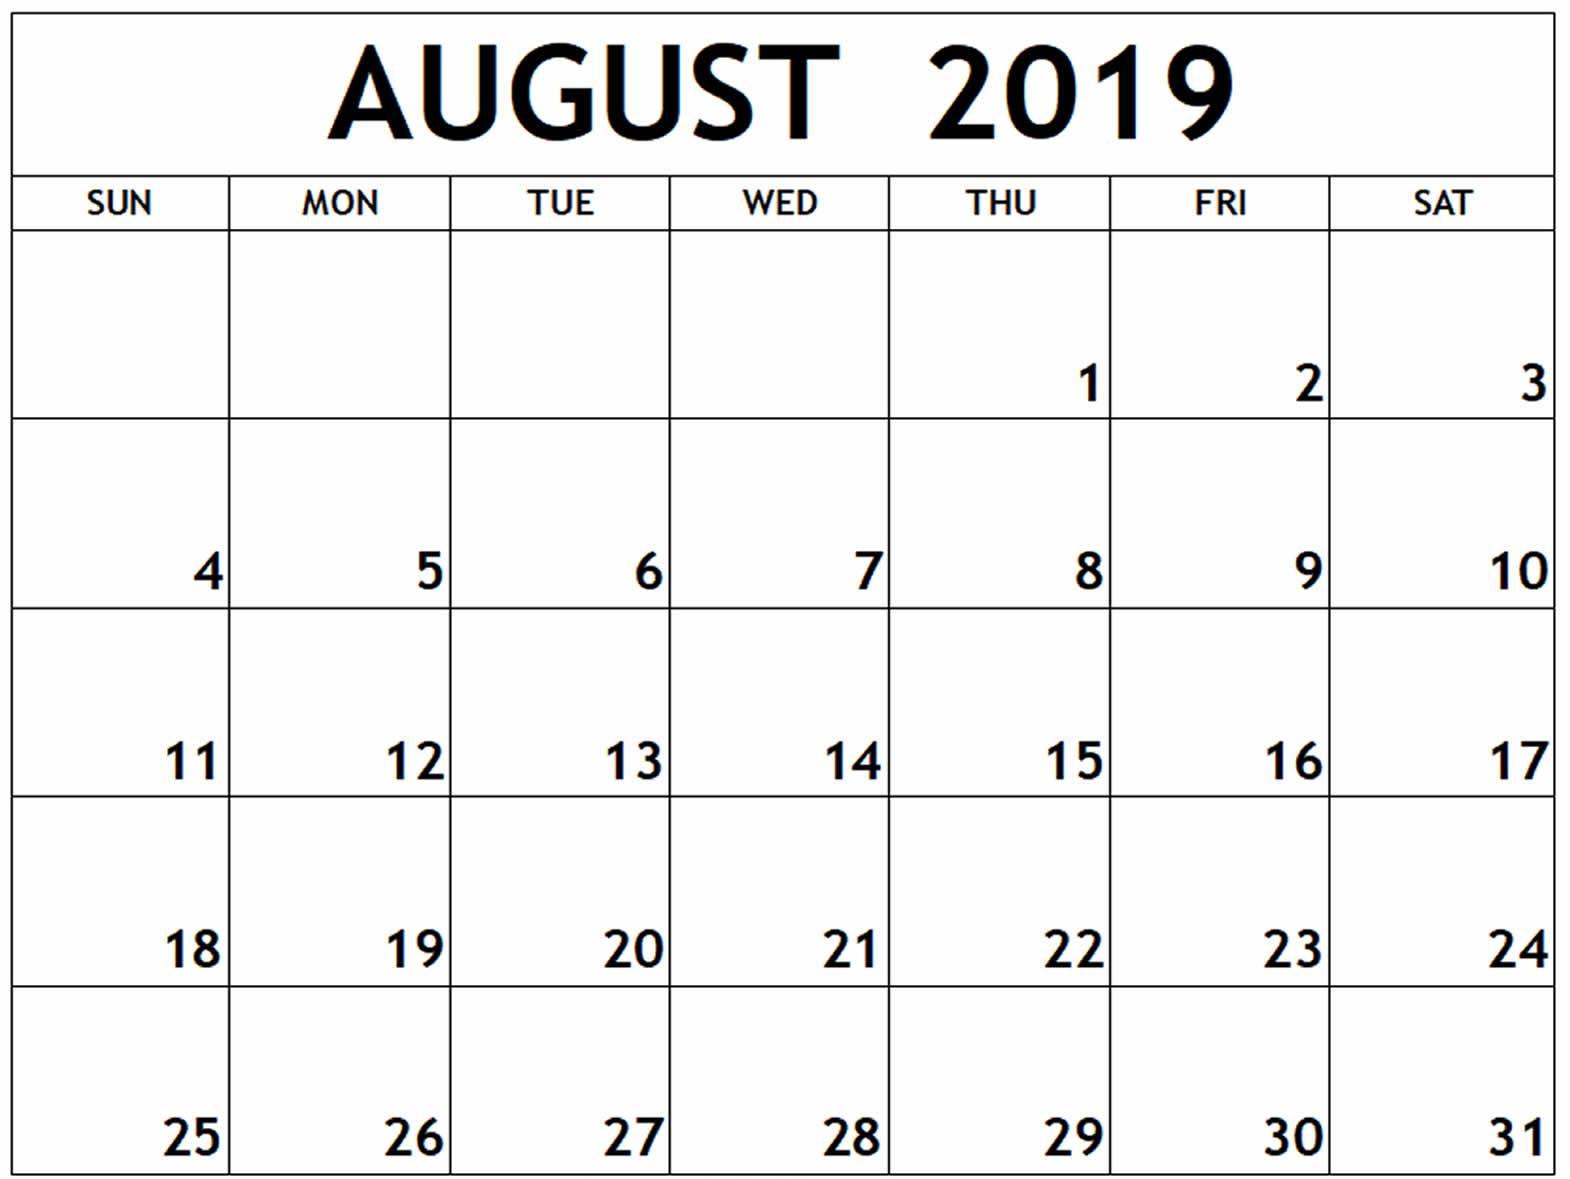 August 2019 Calendar Printable - Free August 2019 Calendar Printable intended for Blank Calendar Template For August